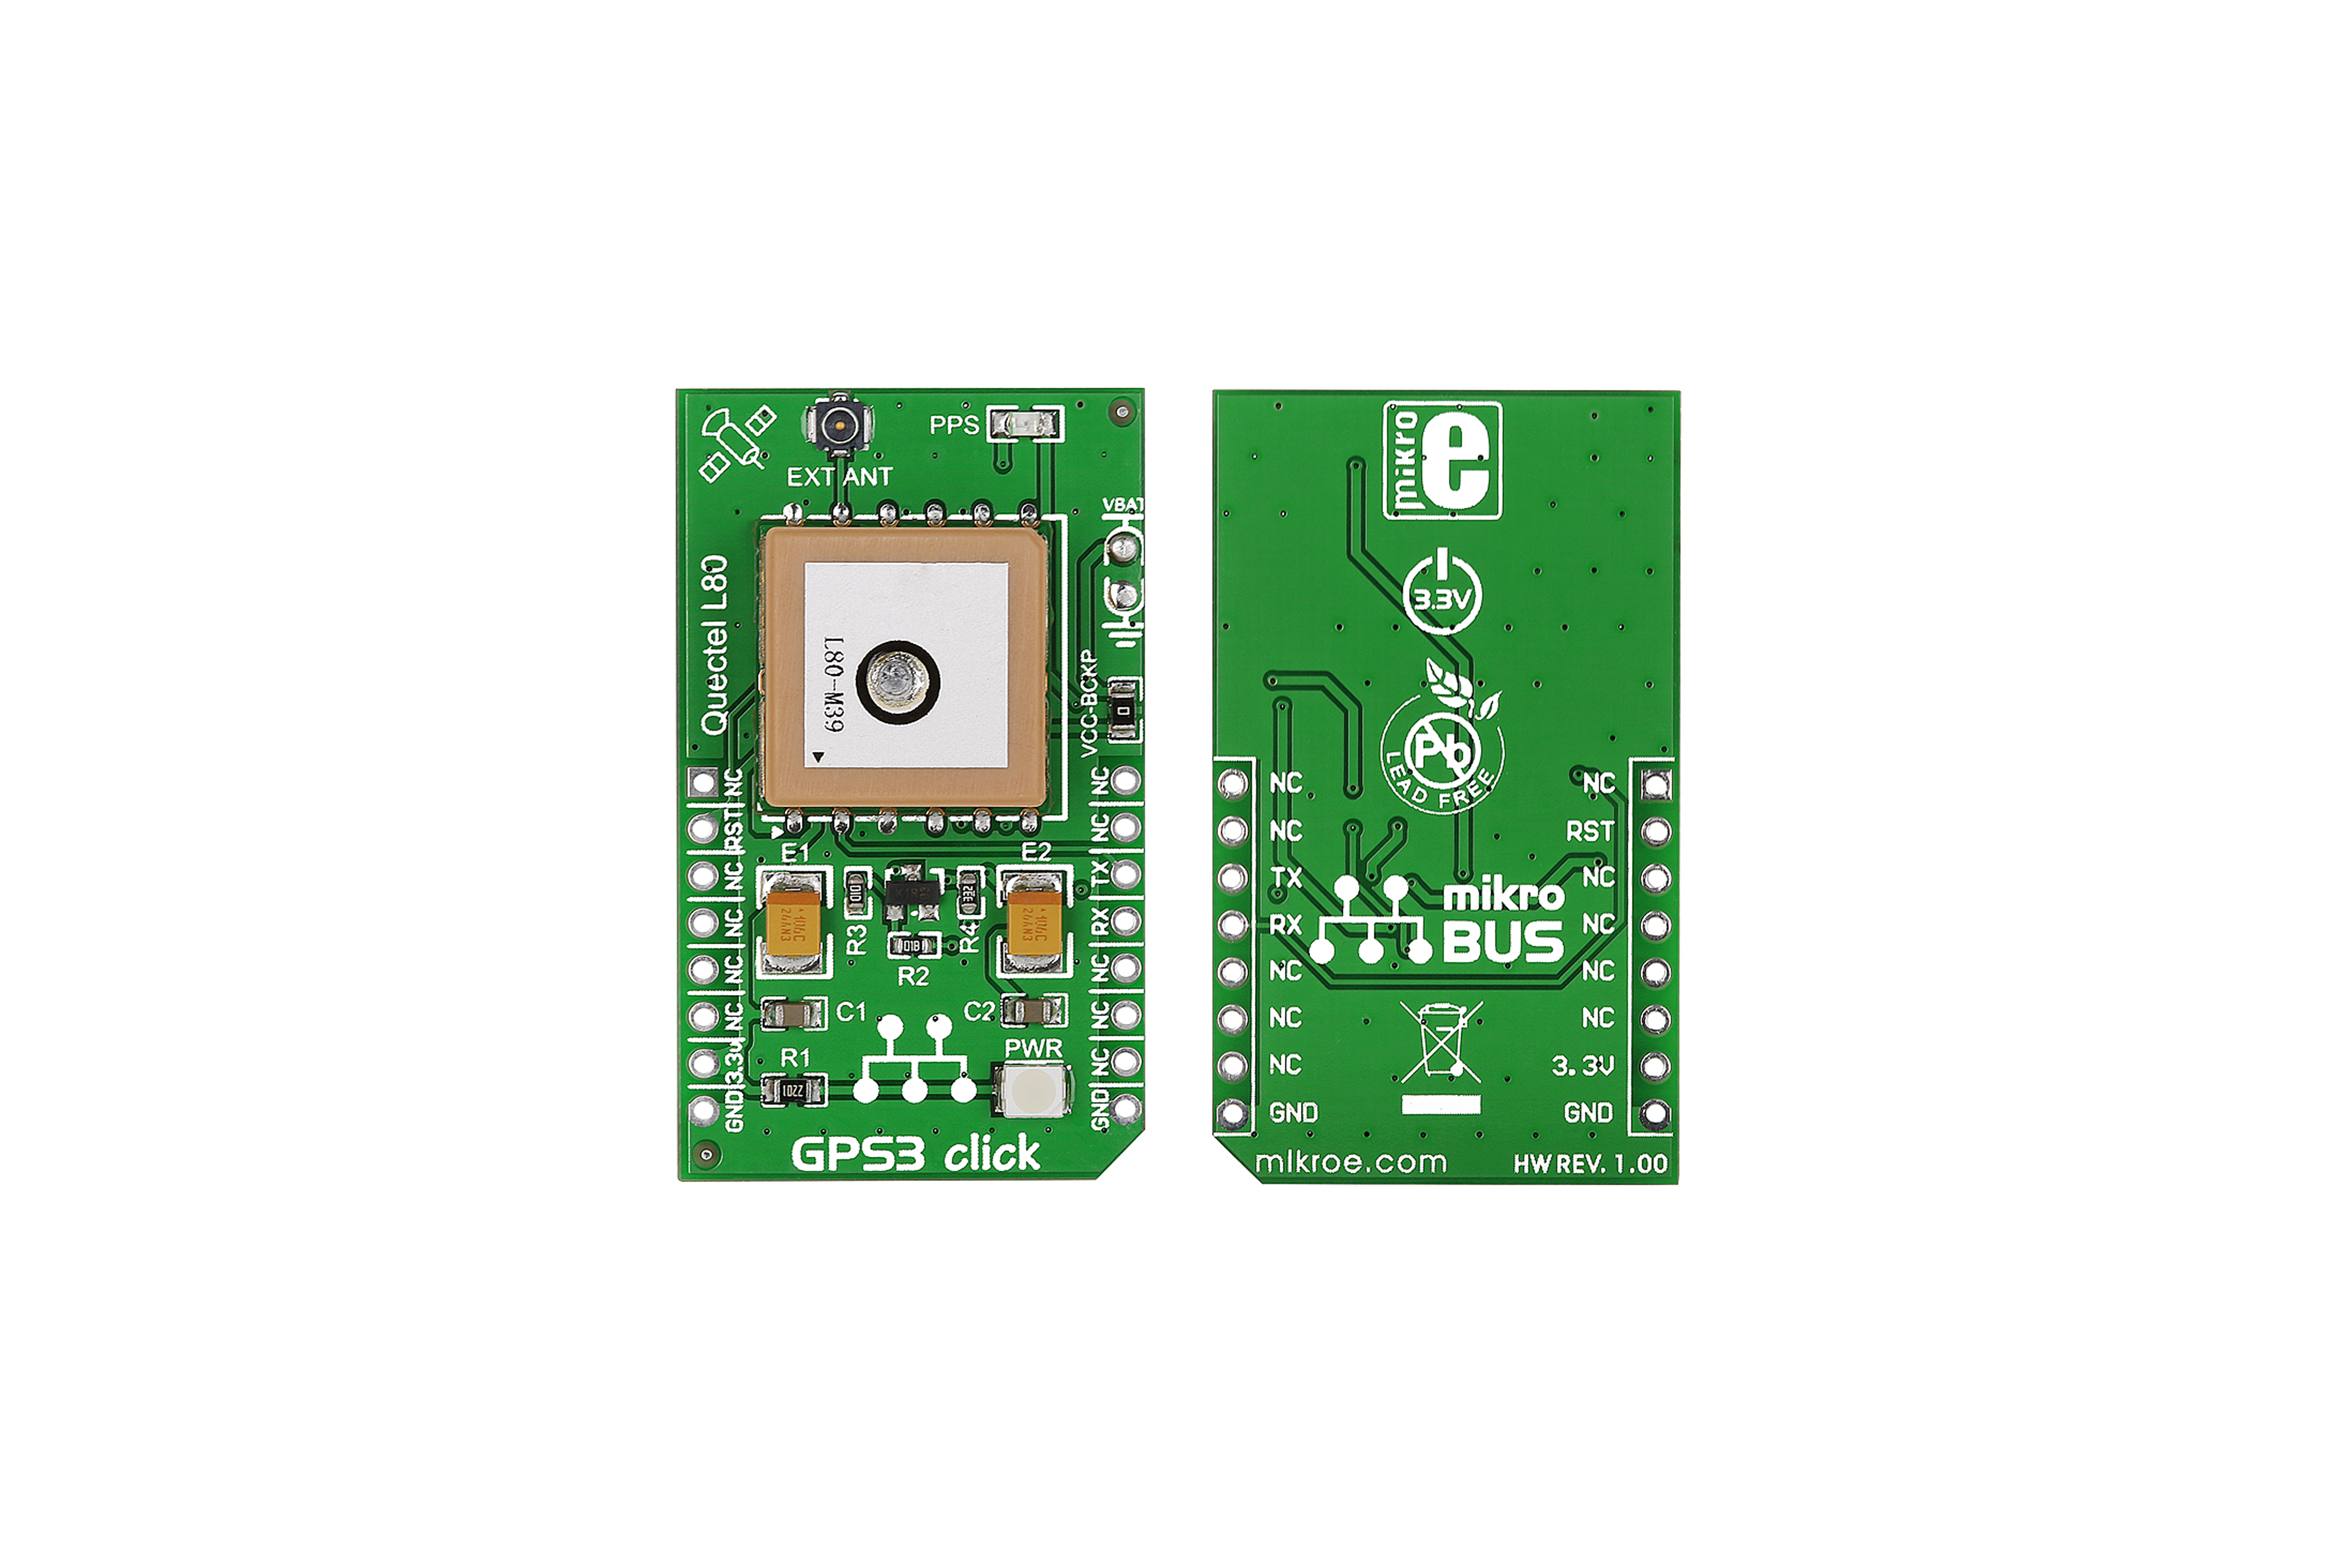 MikroElektronika GPS3 mikroBus Click Board voor L80 GPS